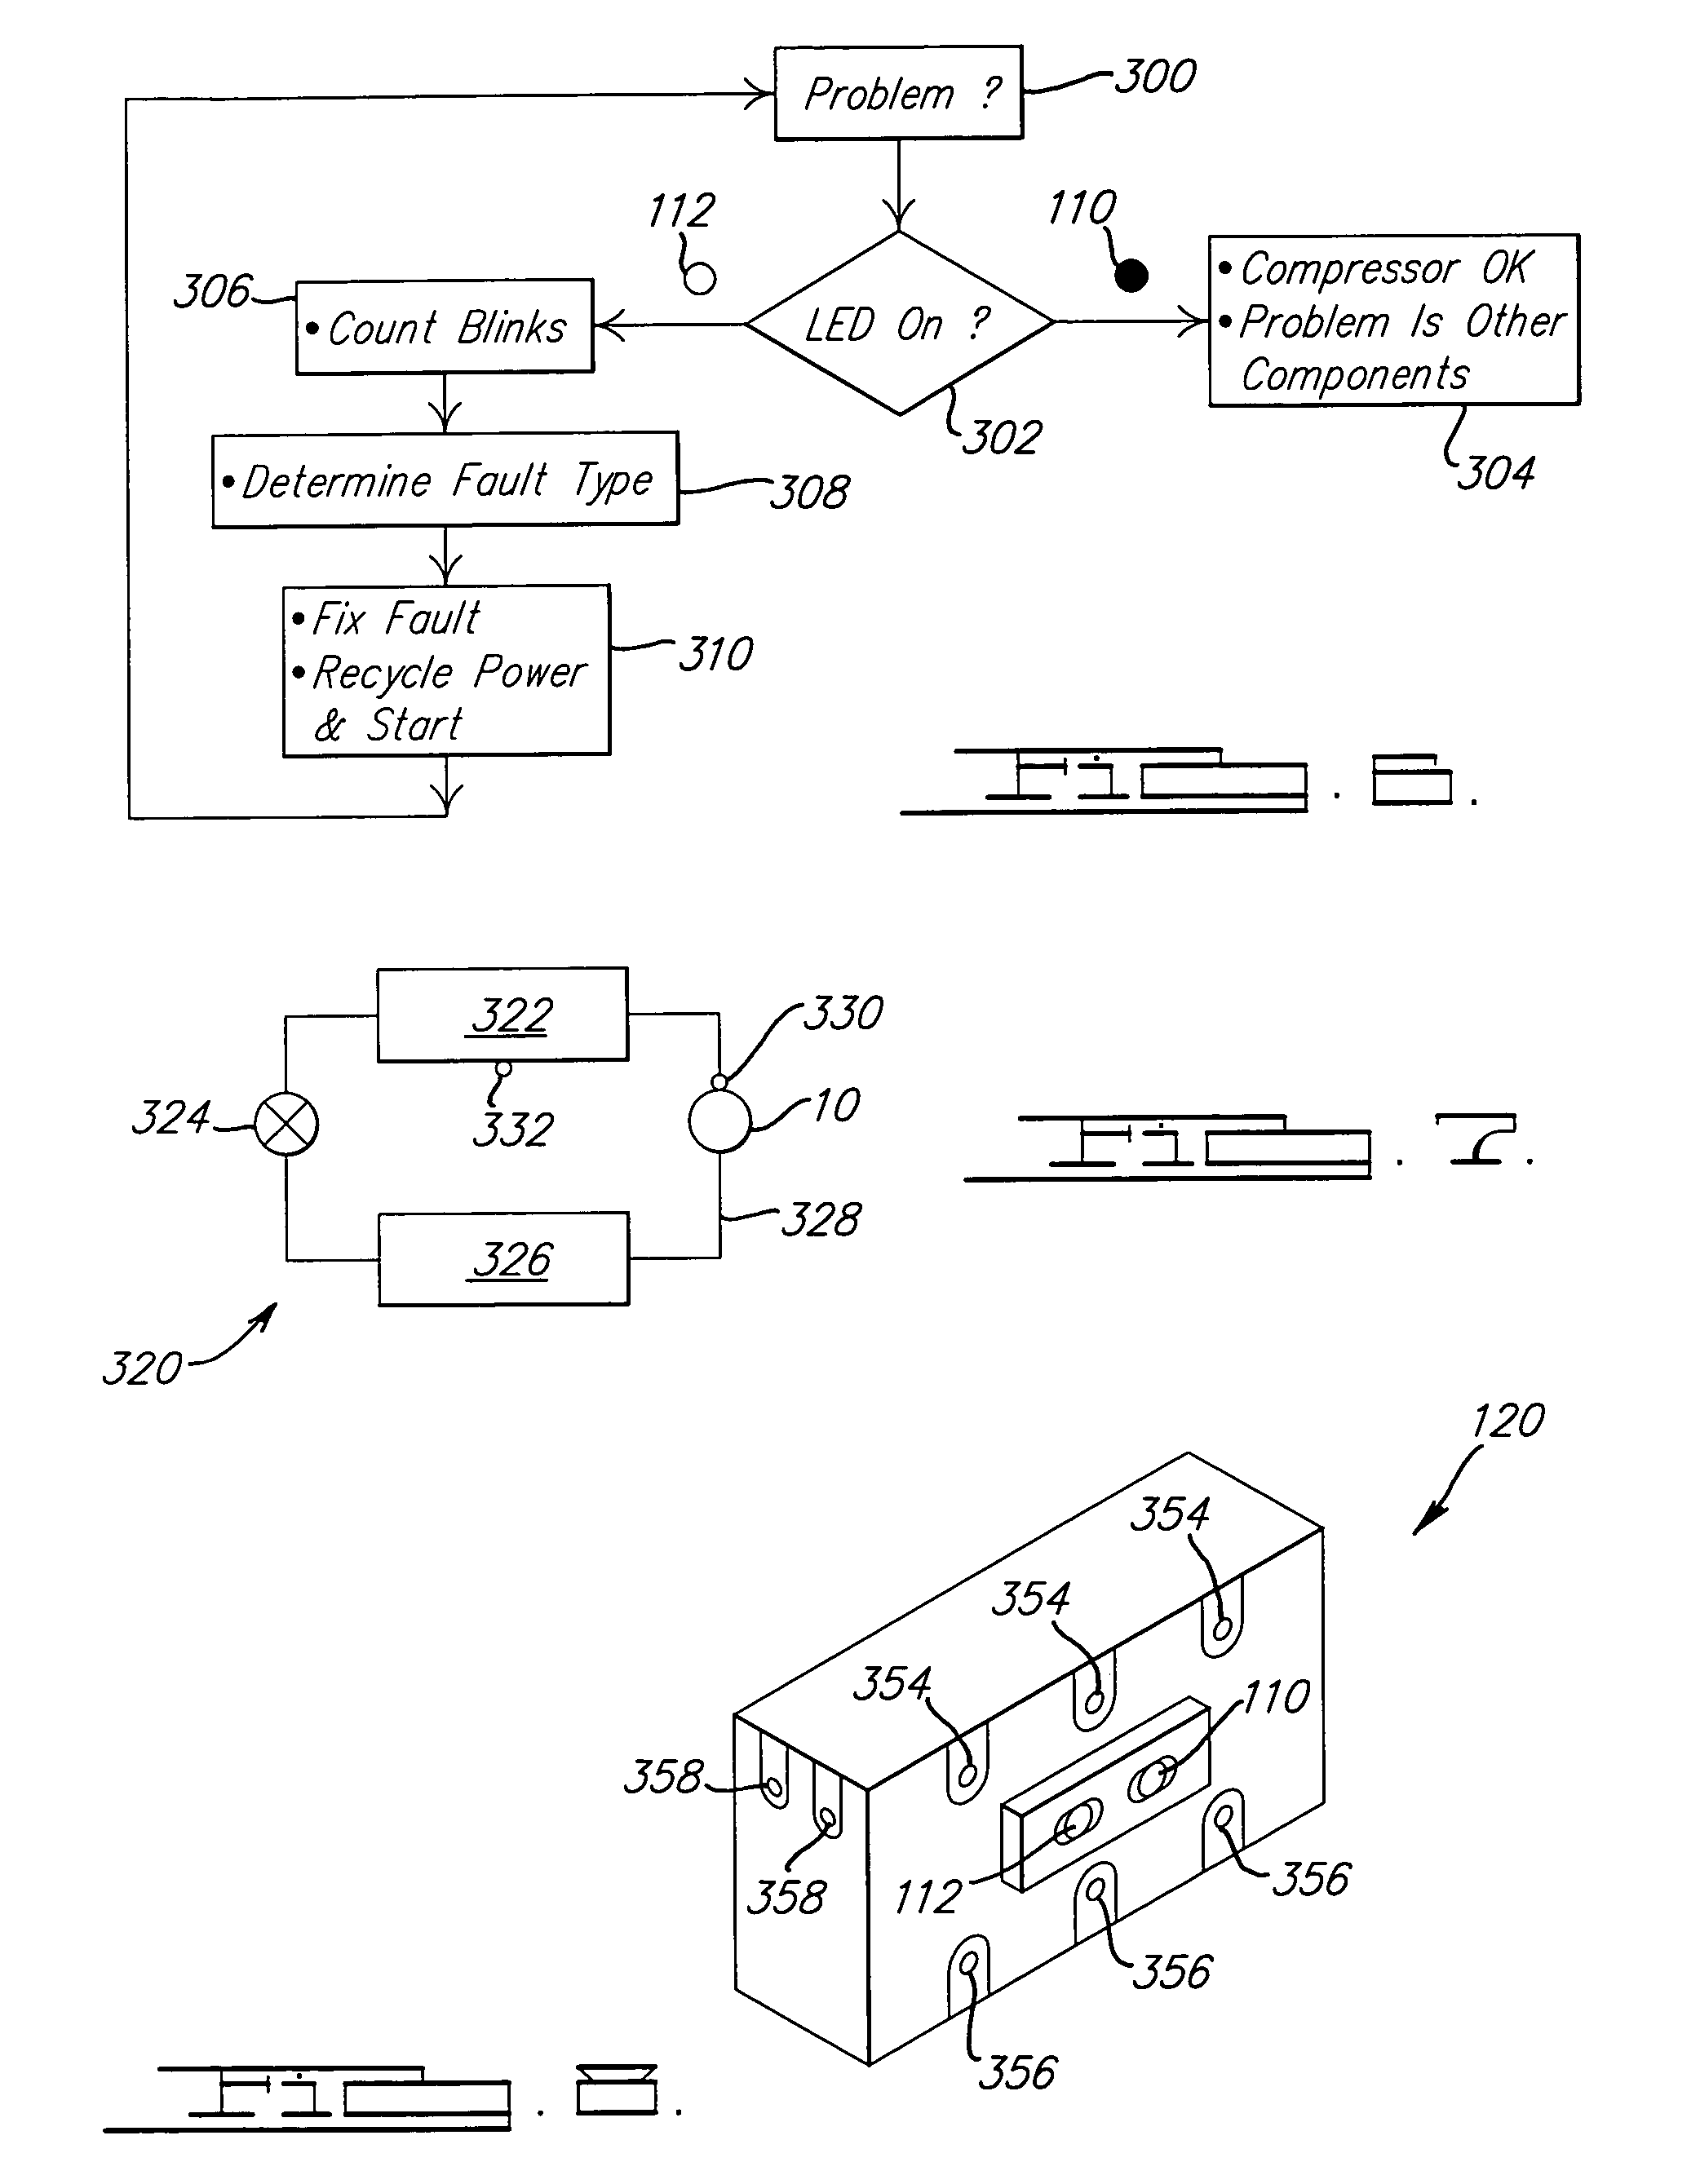 dayton timer relay wiring diagram 2002 chevy impala parts 6k376ba get free image about